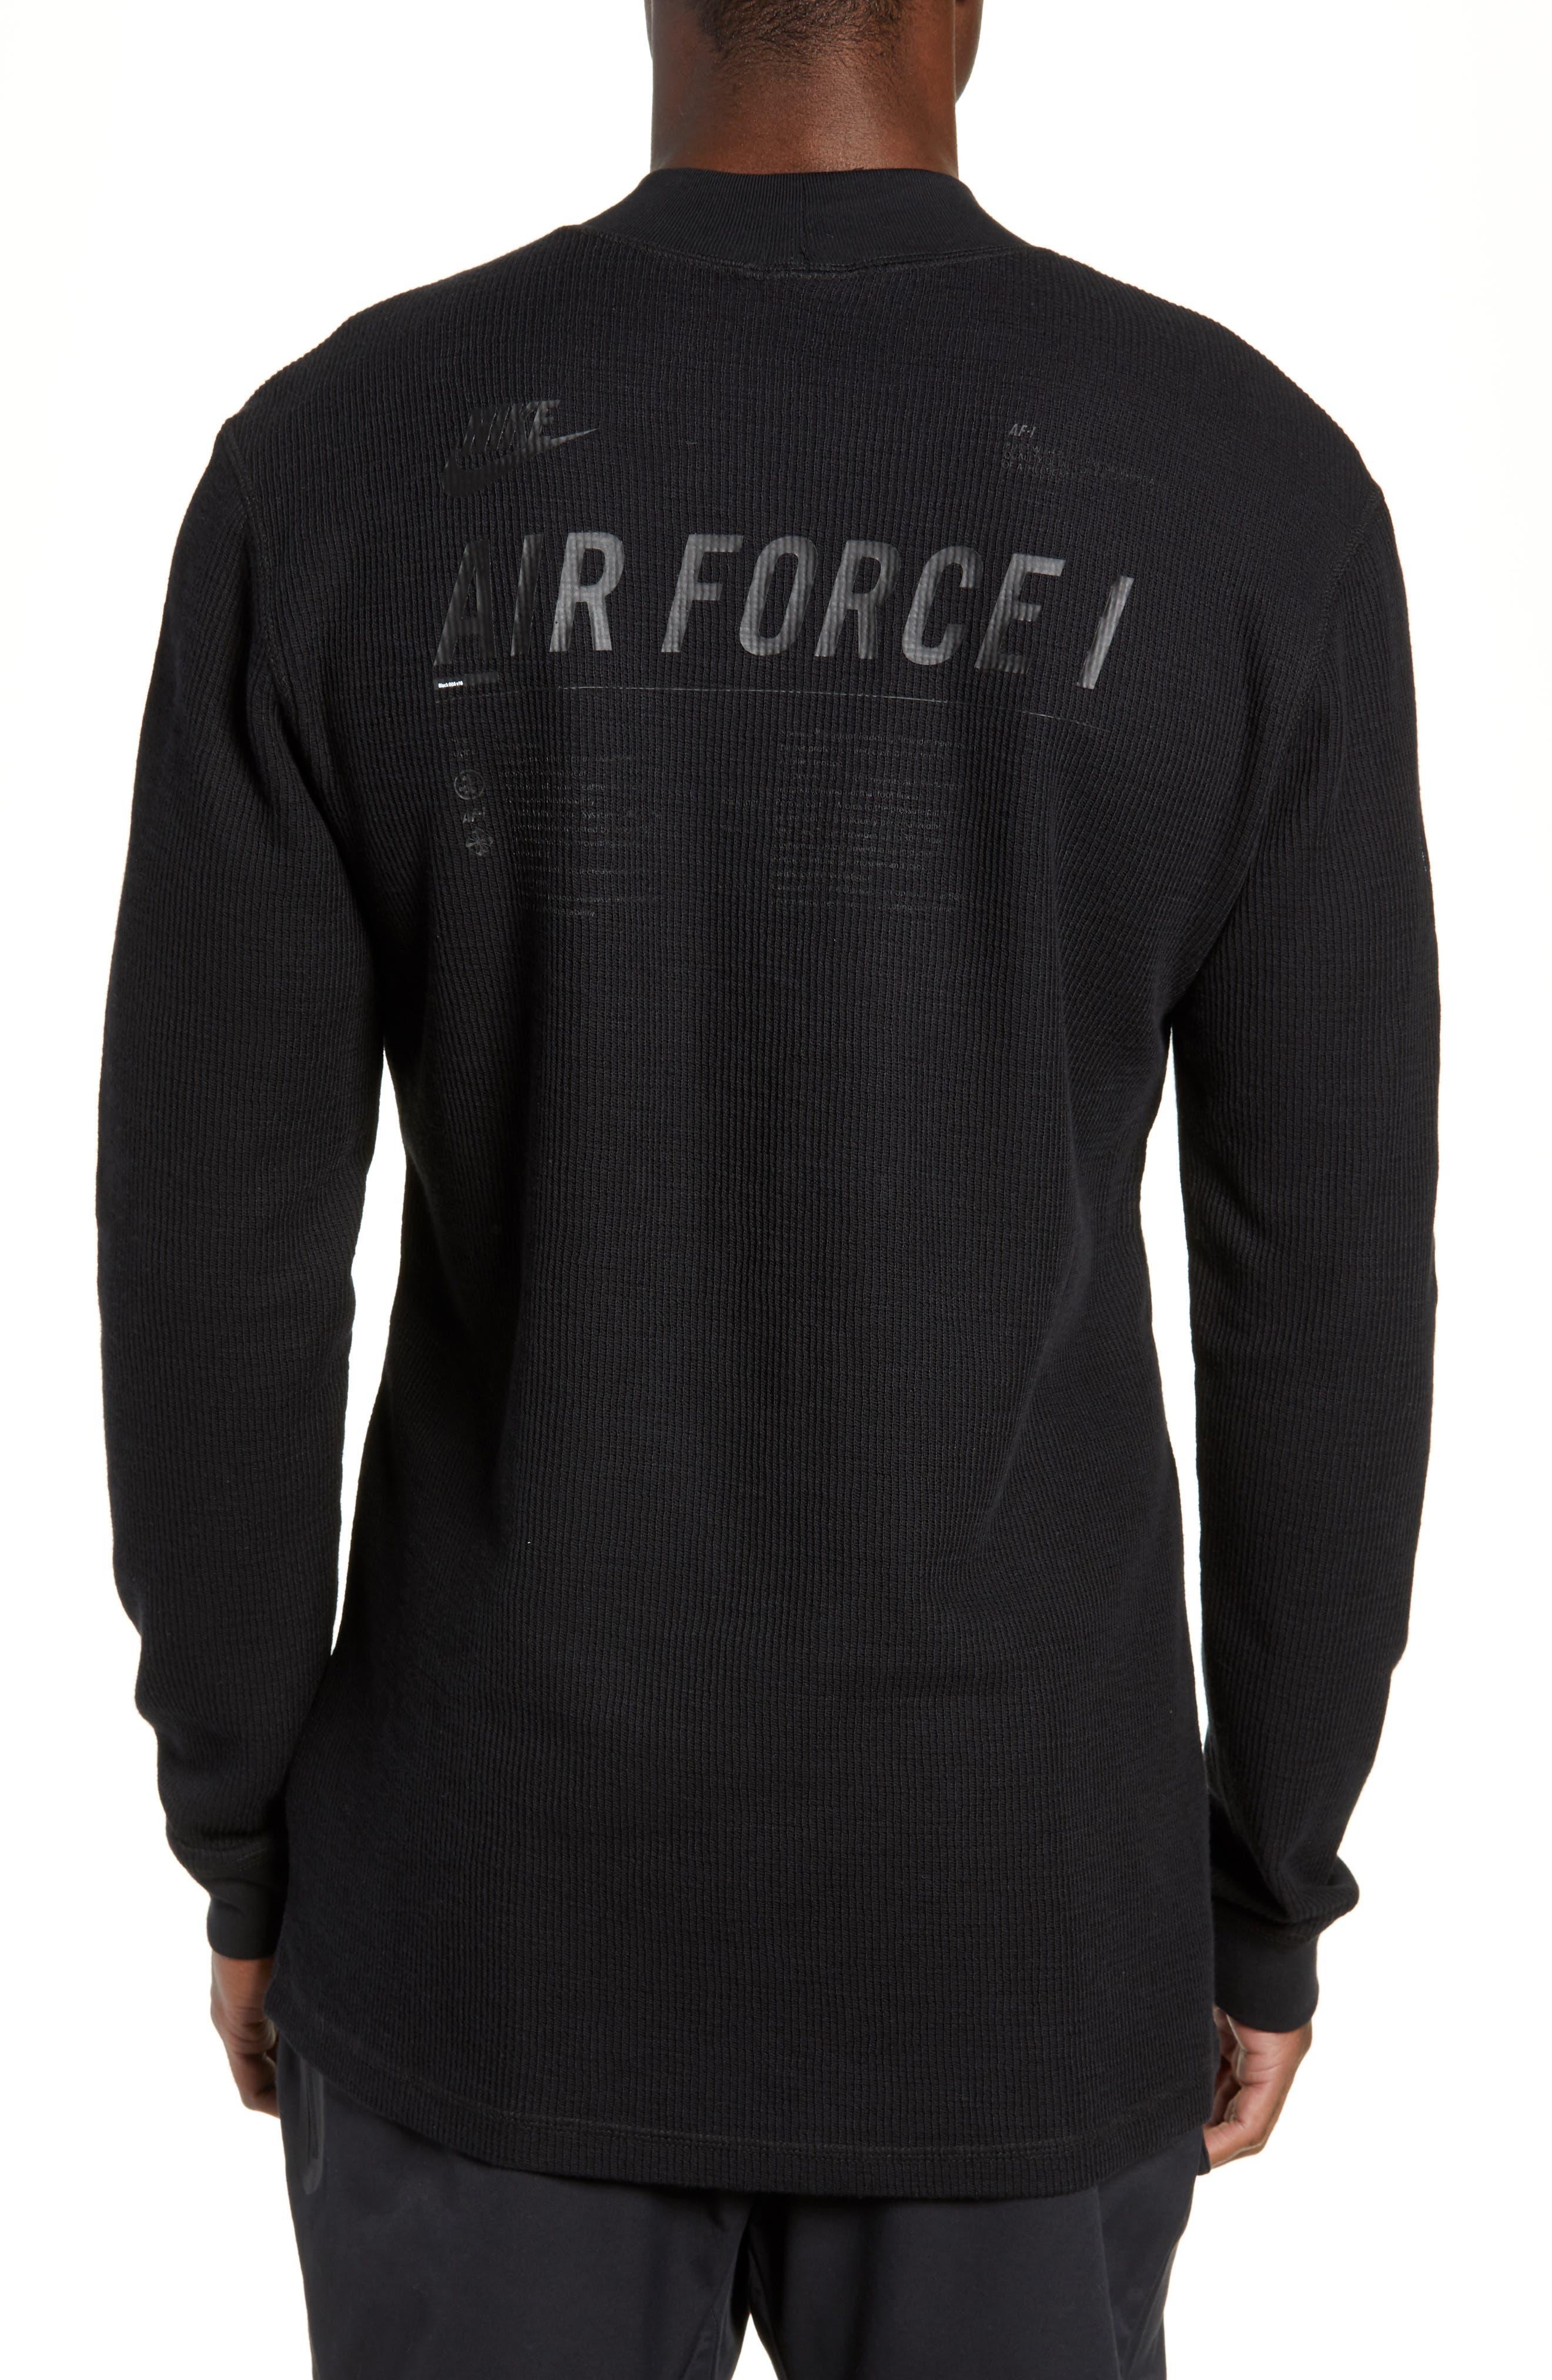 Sportswear Air Force 1 Long Sleeve Top,                             Alternate thumbnail 2, color,                             BLACK